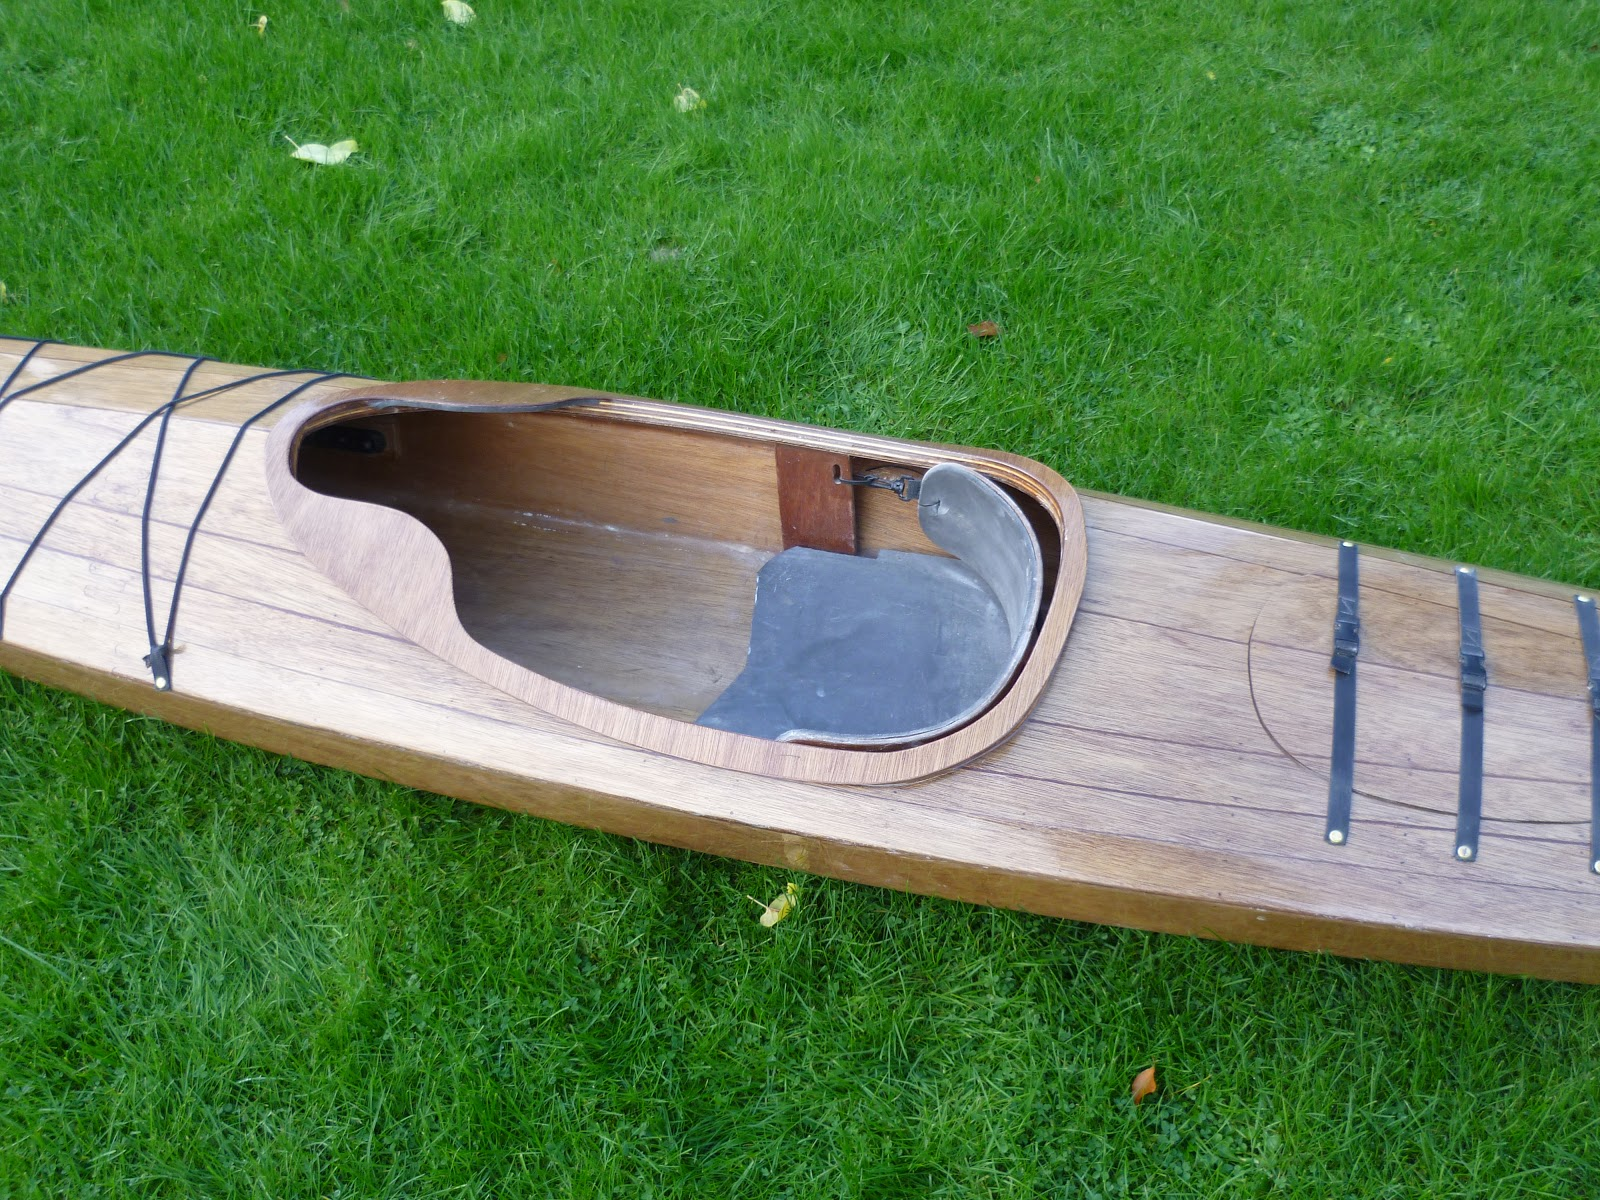 Floating Art: Stitch and glue Sea kayak, sleek and fast